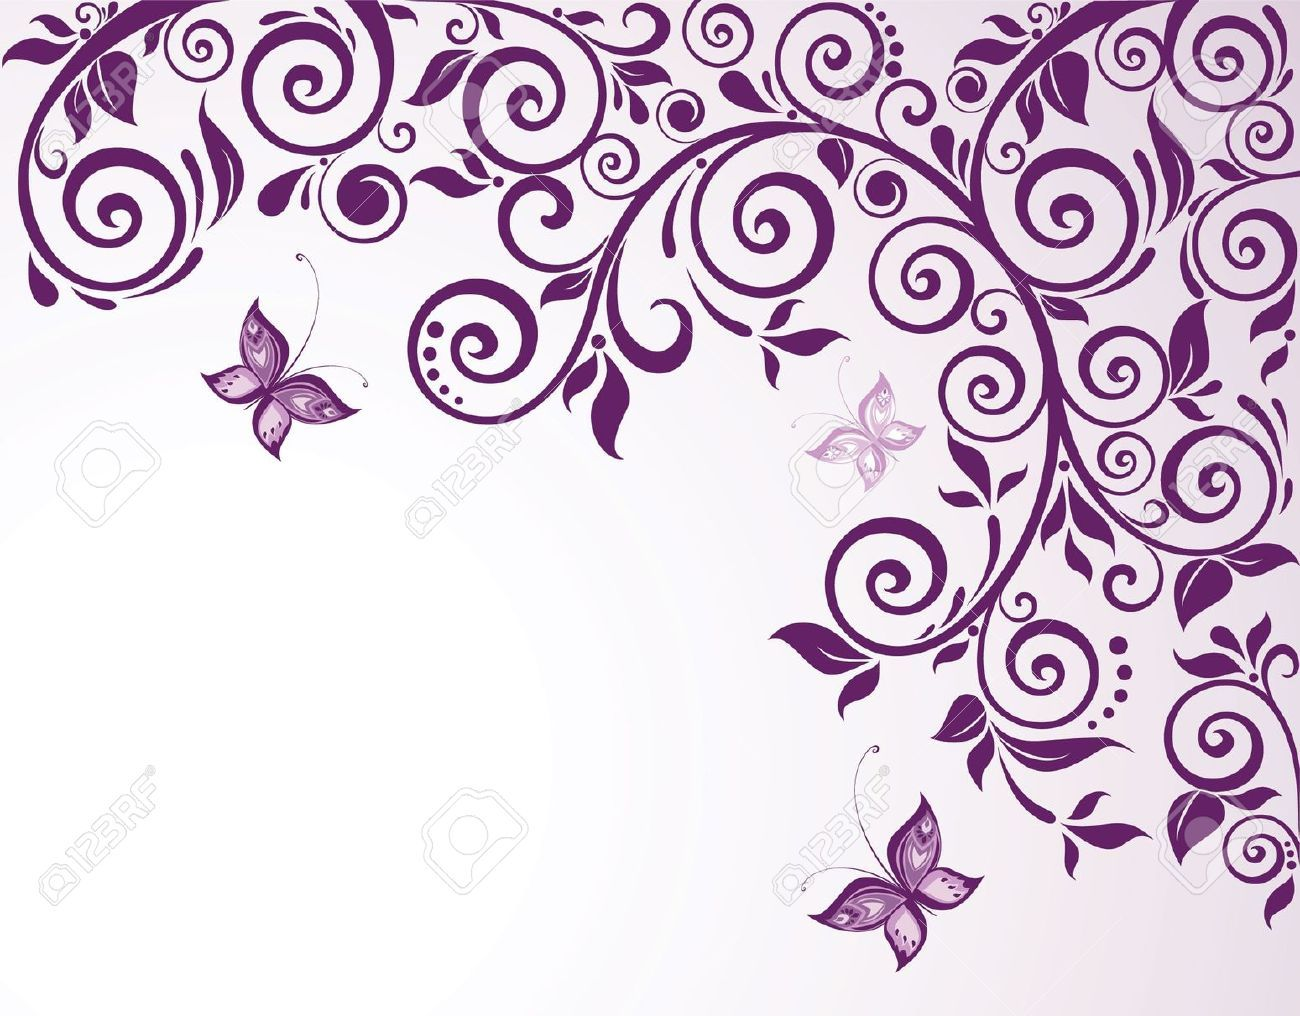 Download premium vector of Purple flower on white